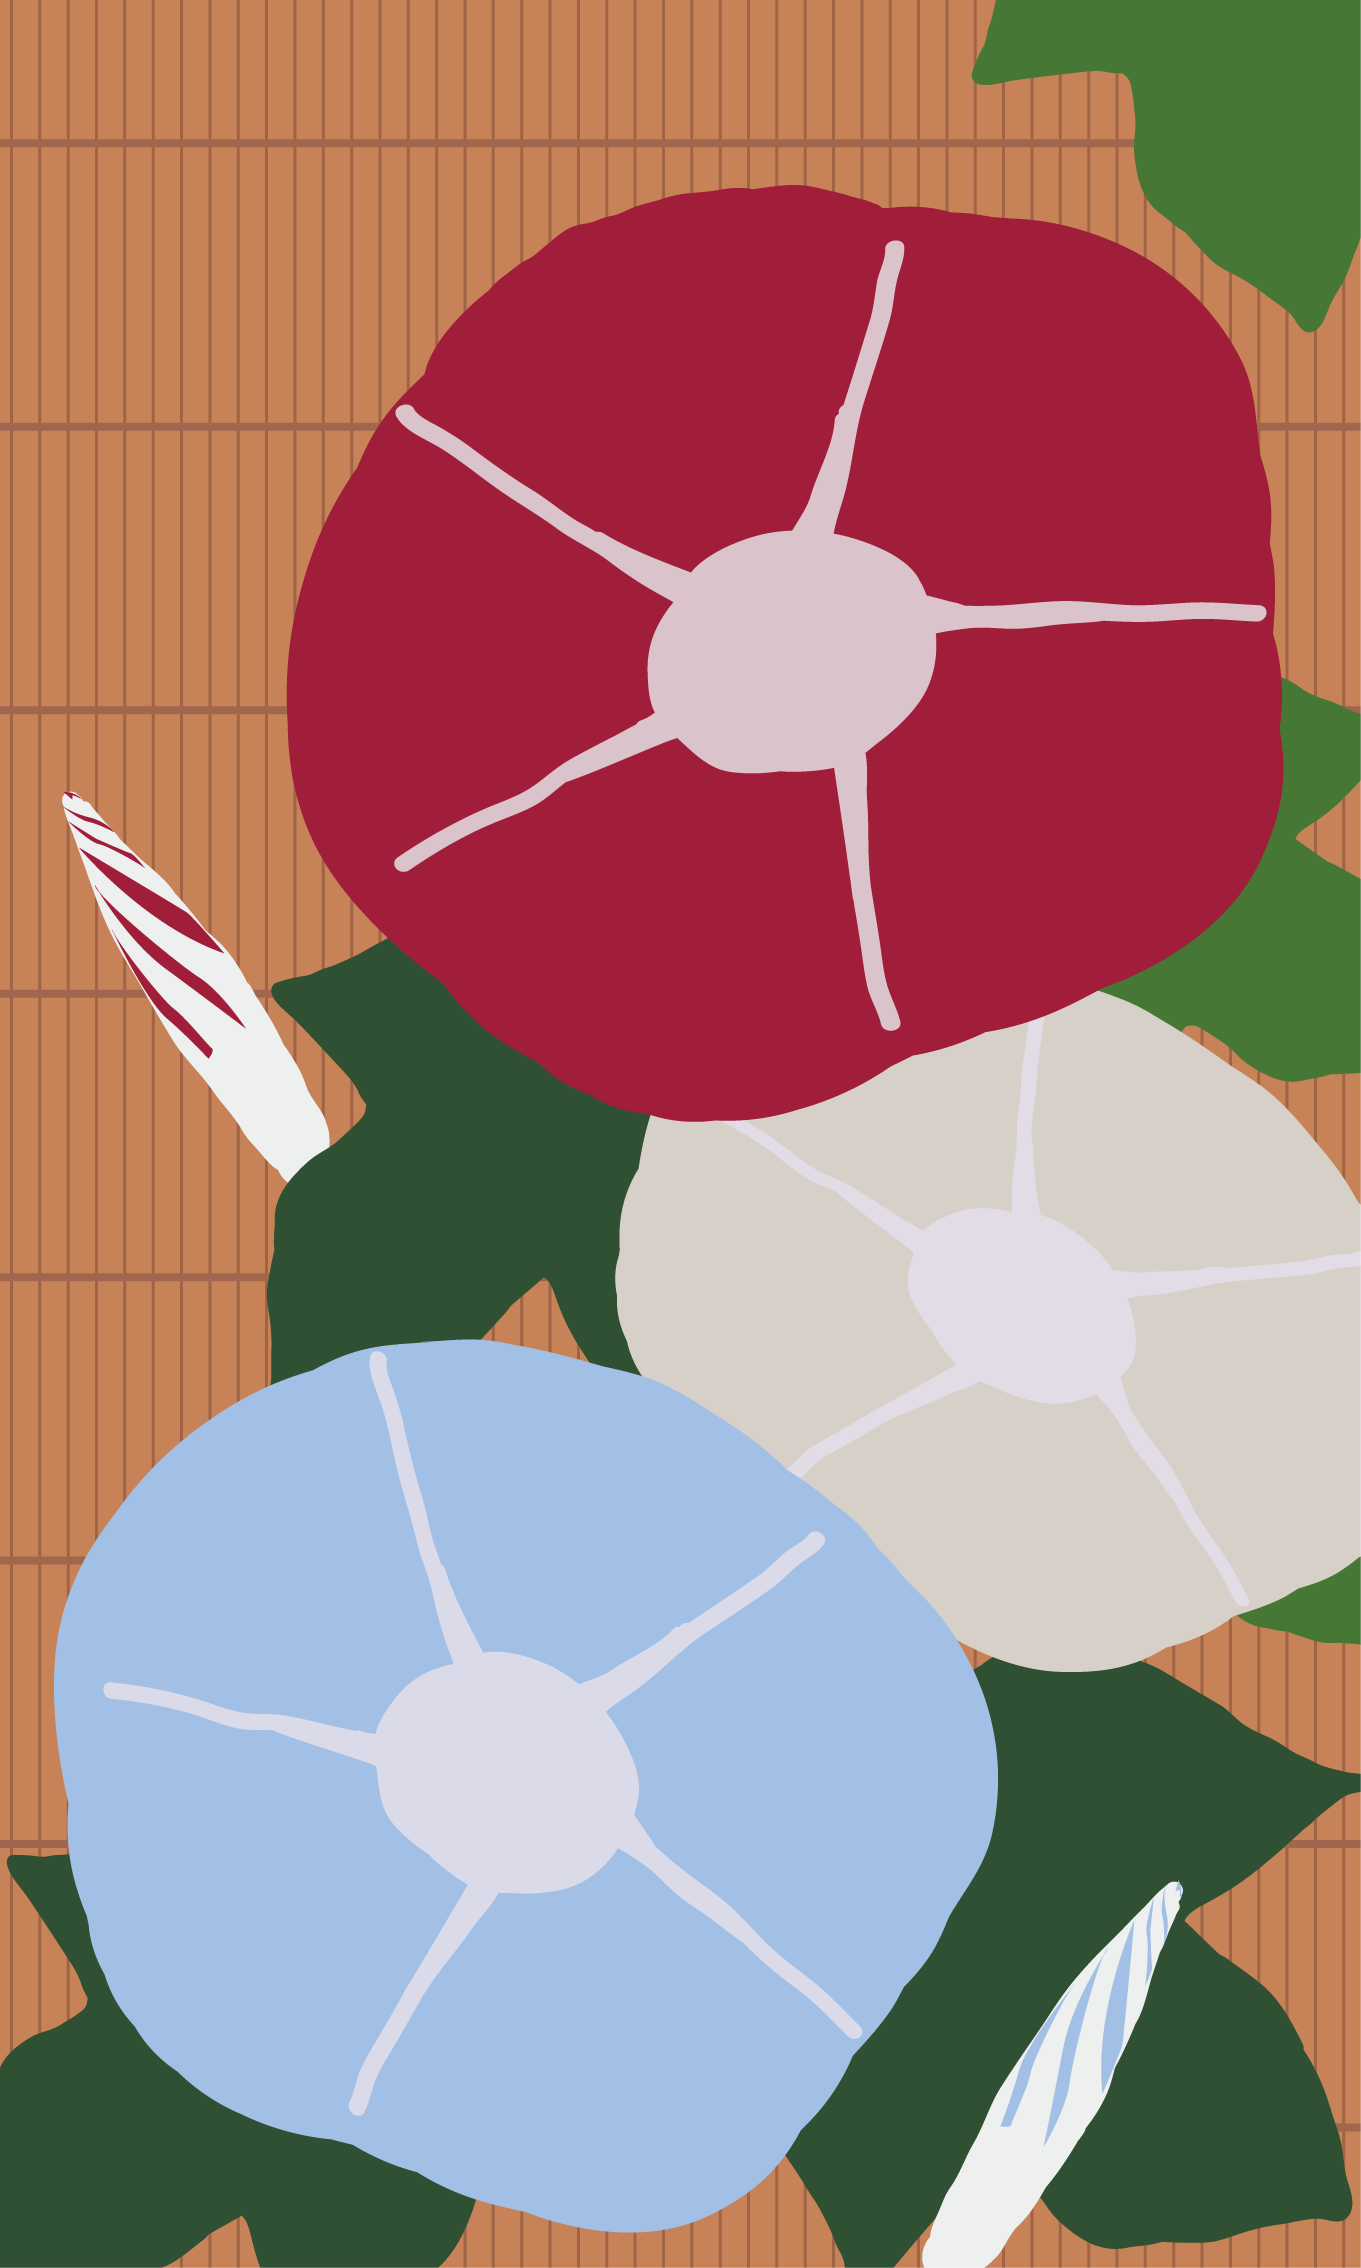 INFOBAR xv用壁紙 | あさがお NISHIKIGOI(480x800)